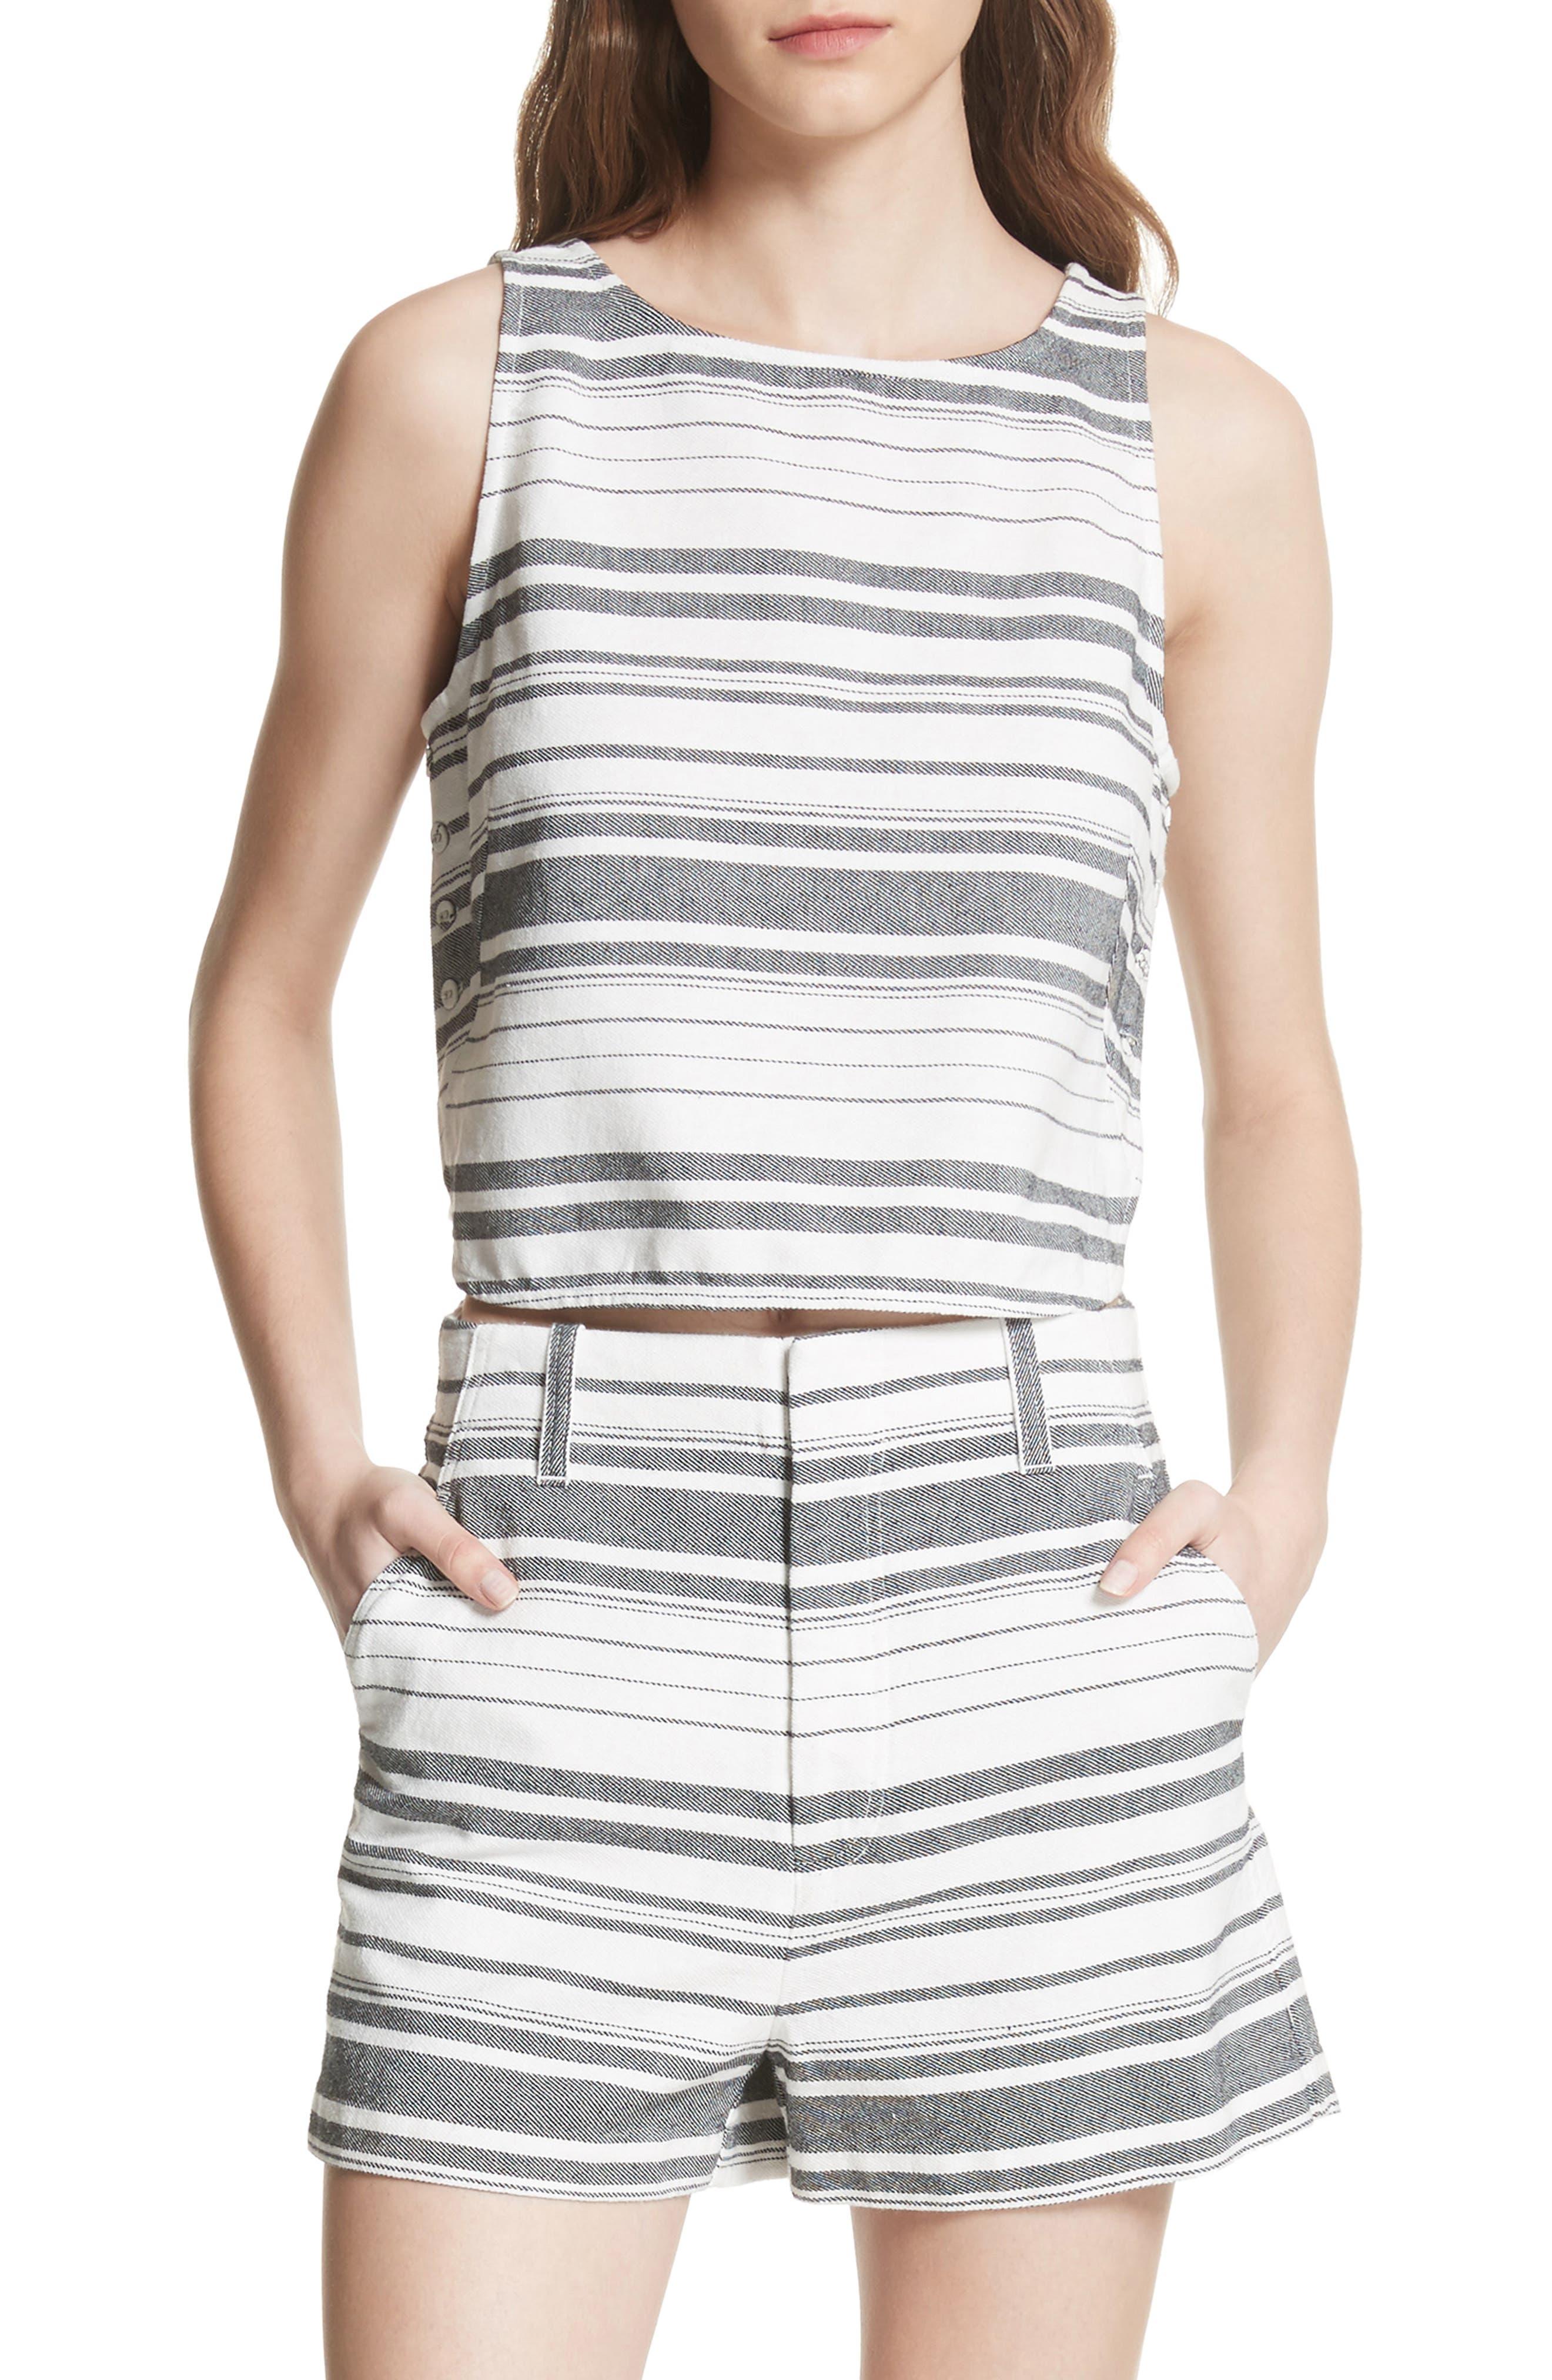 Joie Bryga Stripe Cotton Twill Top